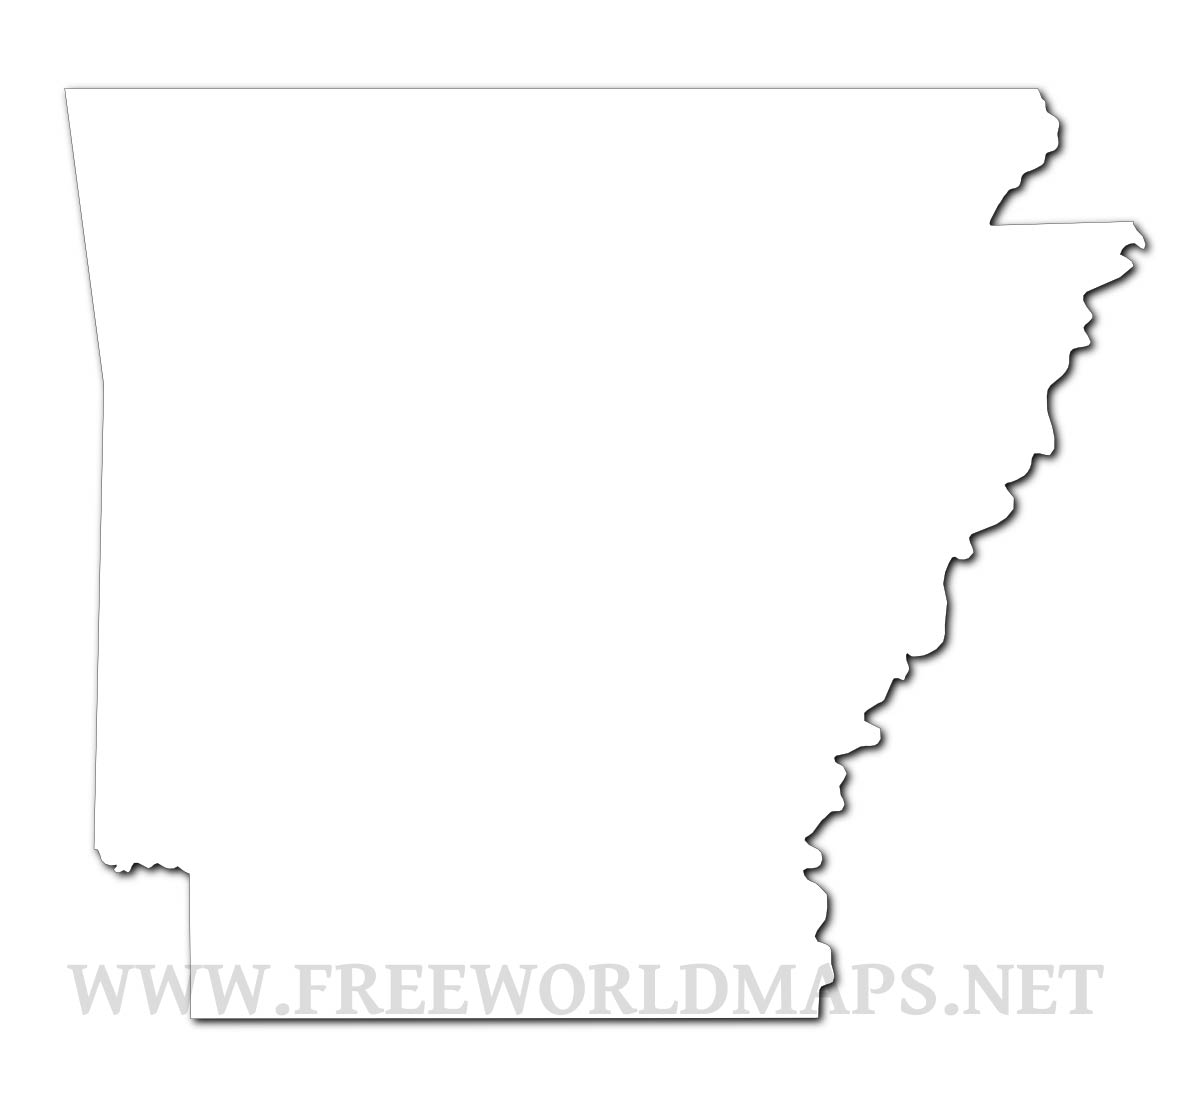 Image of: Arkansas Maps